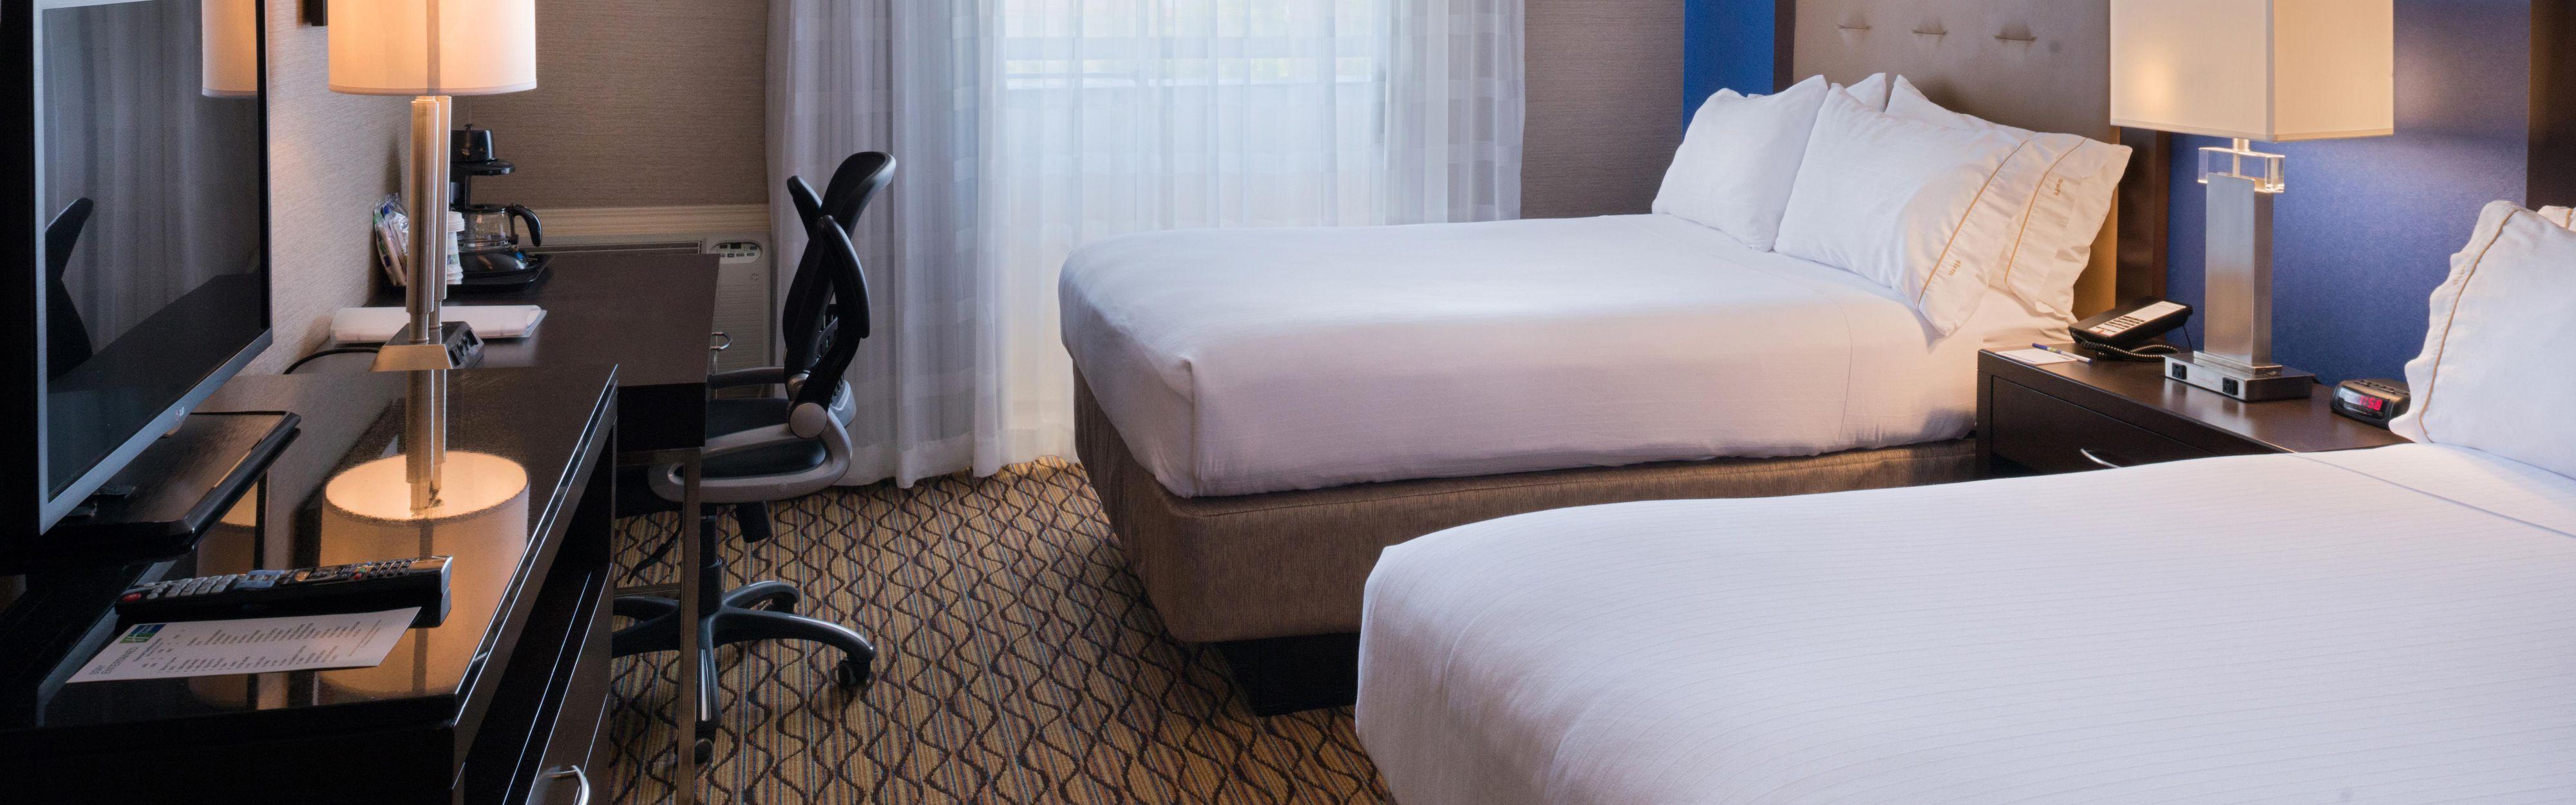 Holiday Inn Express Pasadena-Colorado Blvd. image 1